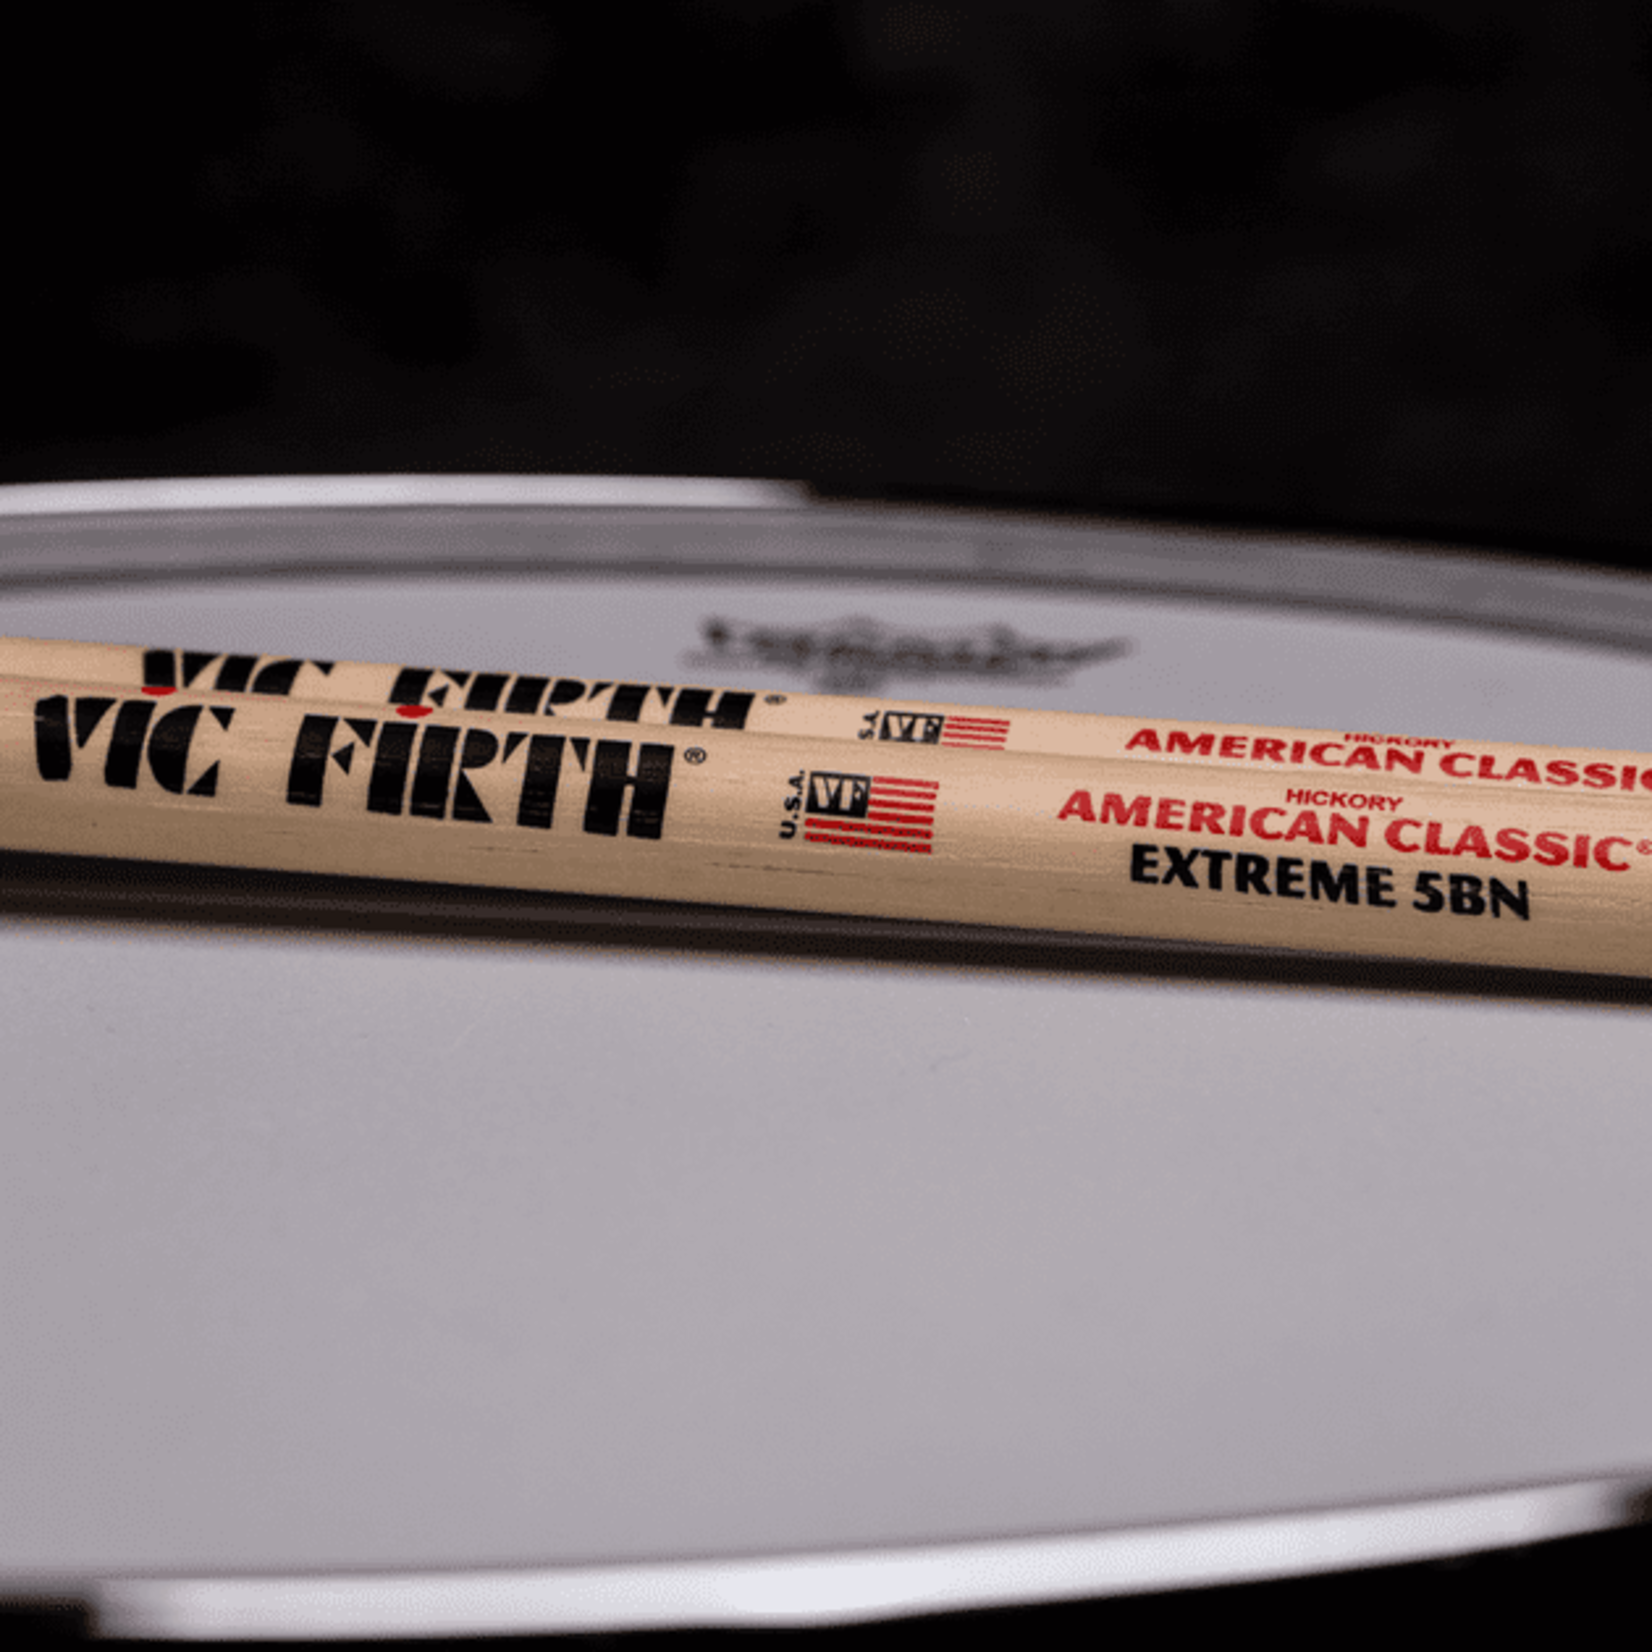 Vic Firth VIC FIRTH AMERICAN CLASSIC EXTREME 5B NYLON TIP (PAIR)